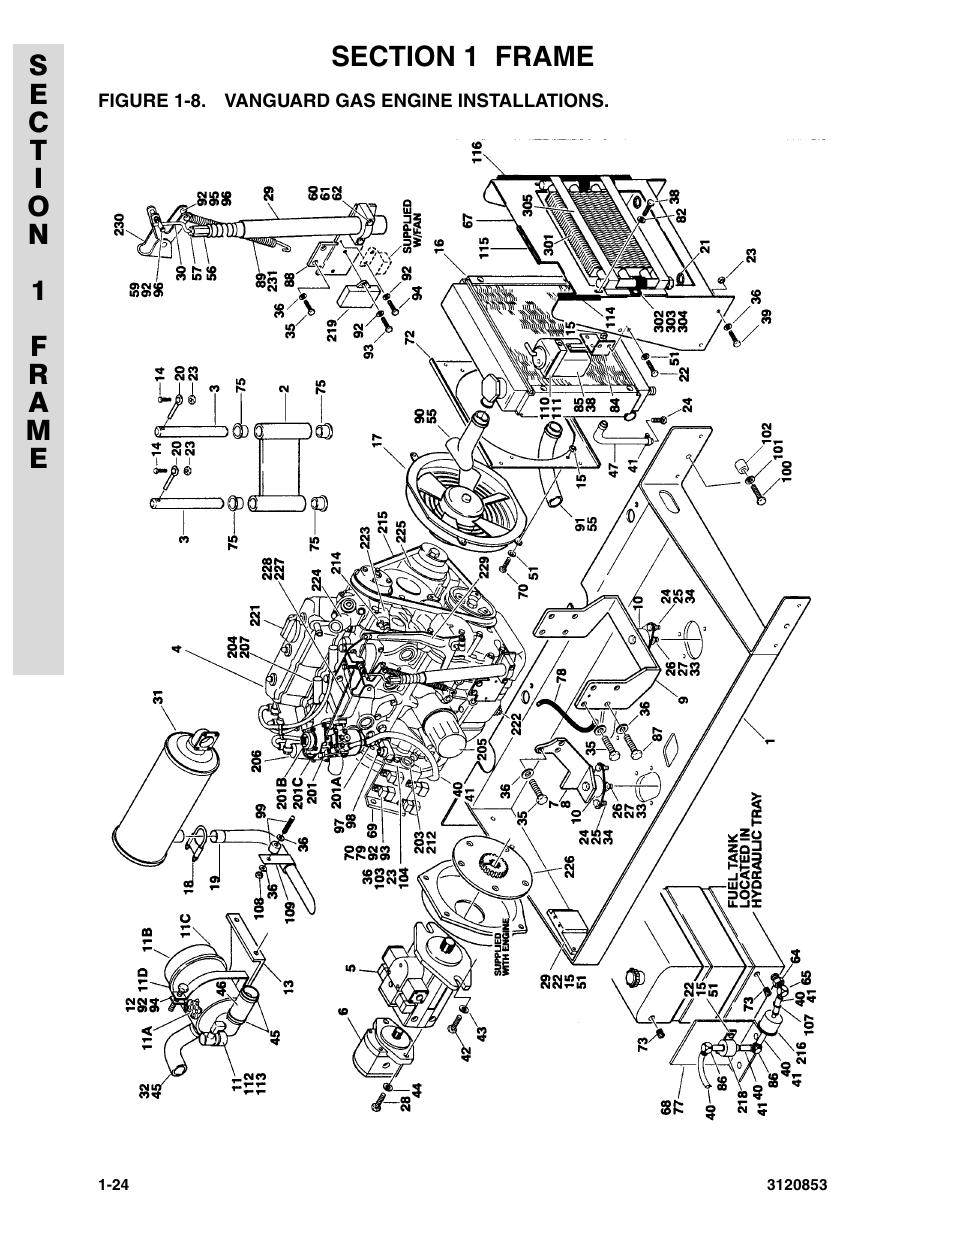 Figure 1-8. vanguard gas engine installations, Vanguard